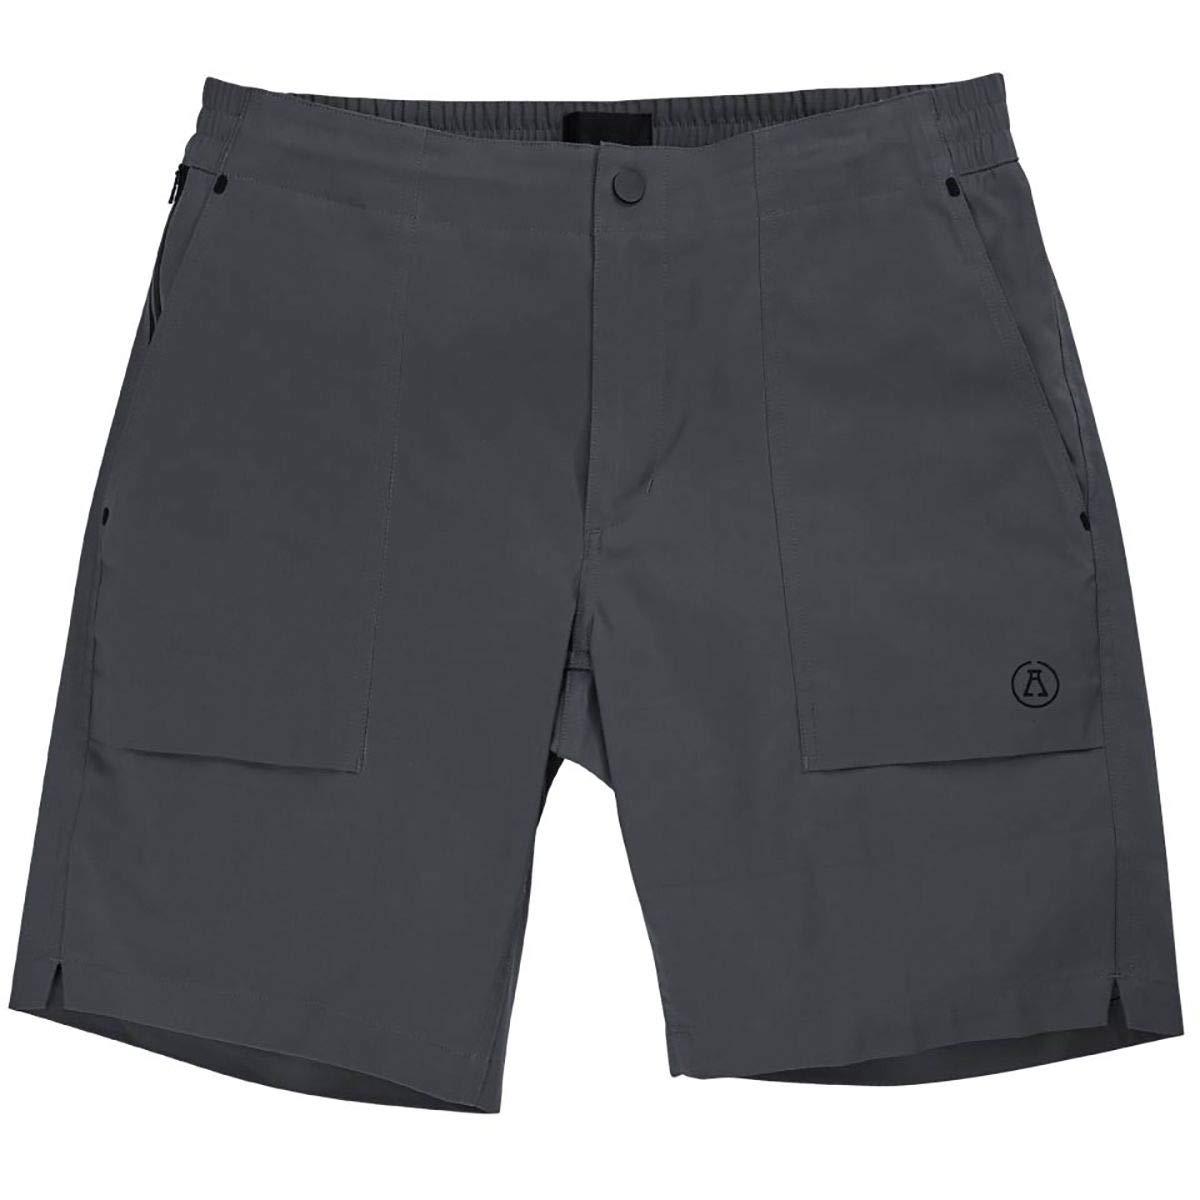 Alchemy Equipment Herren 3xdry Technical Shorts Pants Kurze Hose